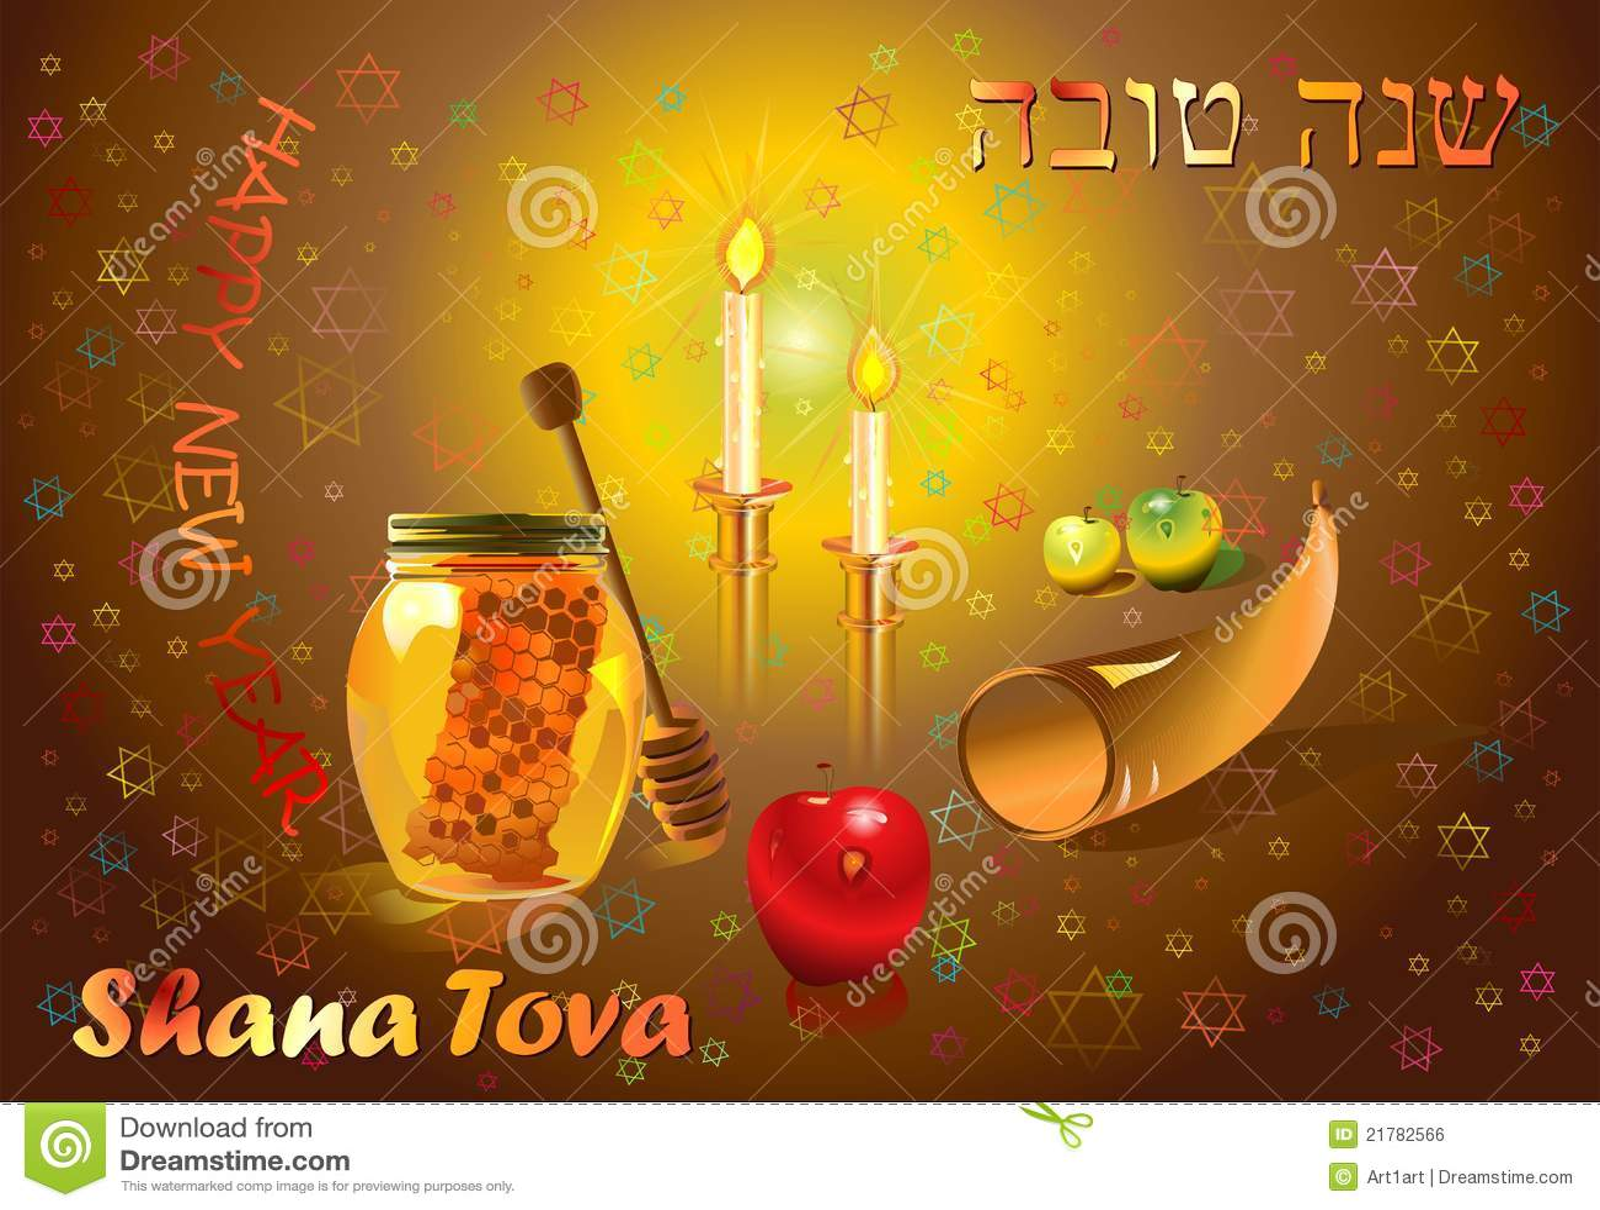 Shana tova stock illustration illustration of apple 21782566 greeting card happy new year m4hsunfo